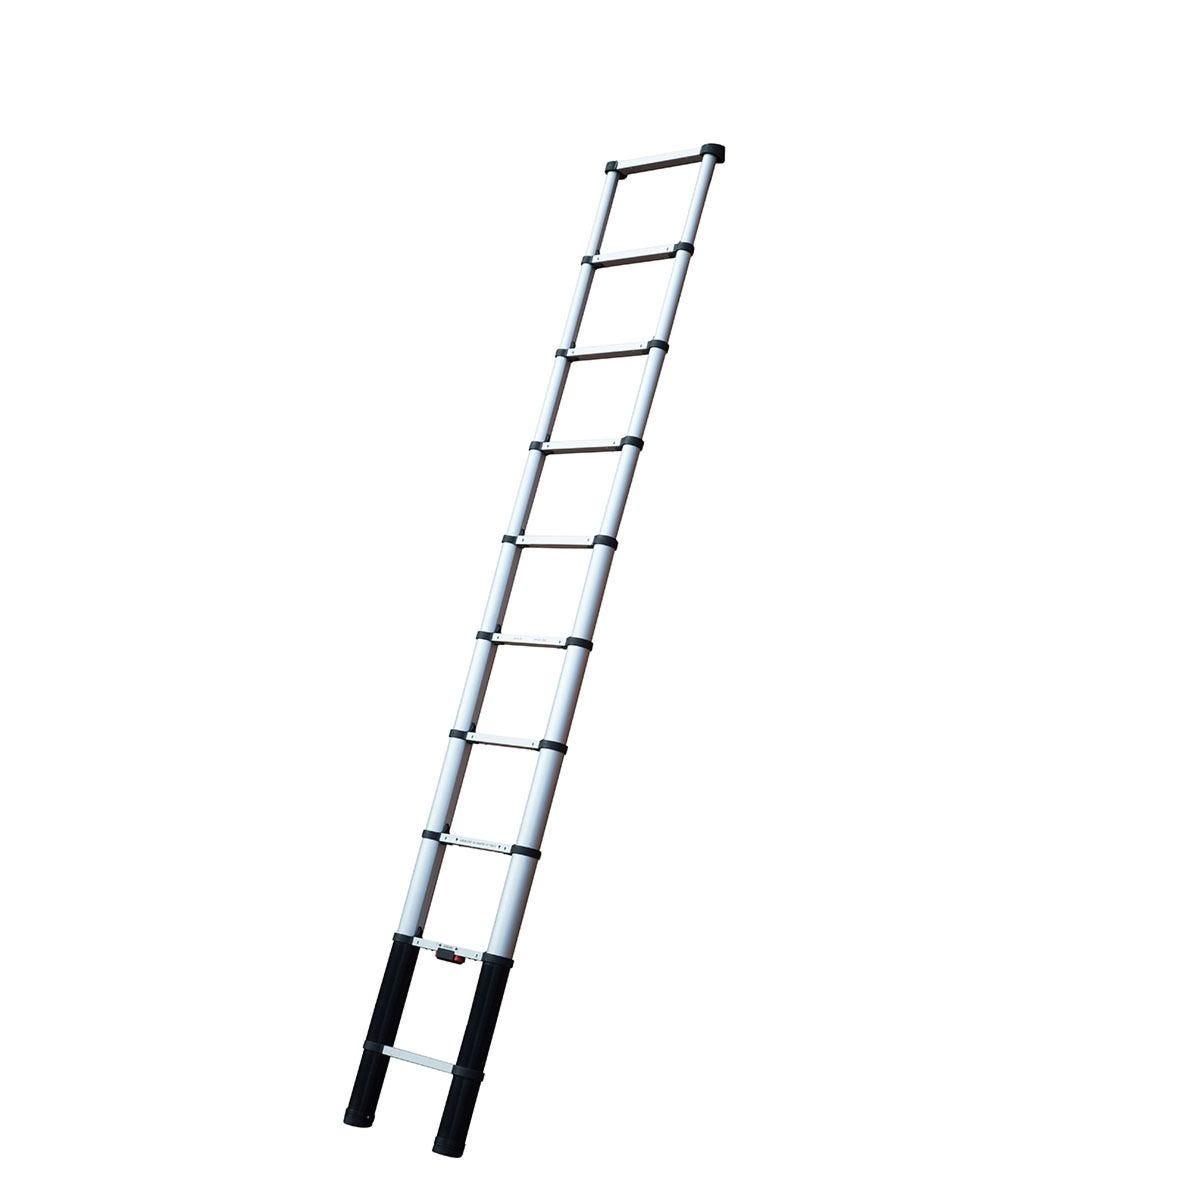 Abru 2.9m Telescopic Extension Ladder